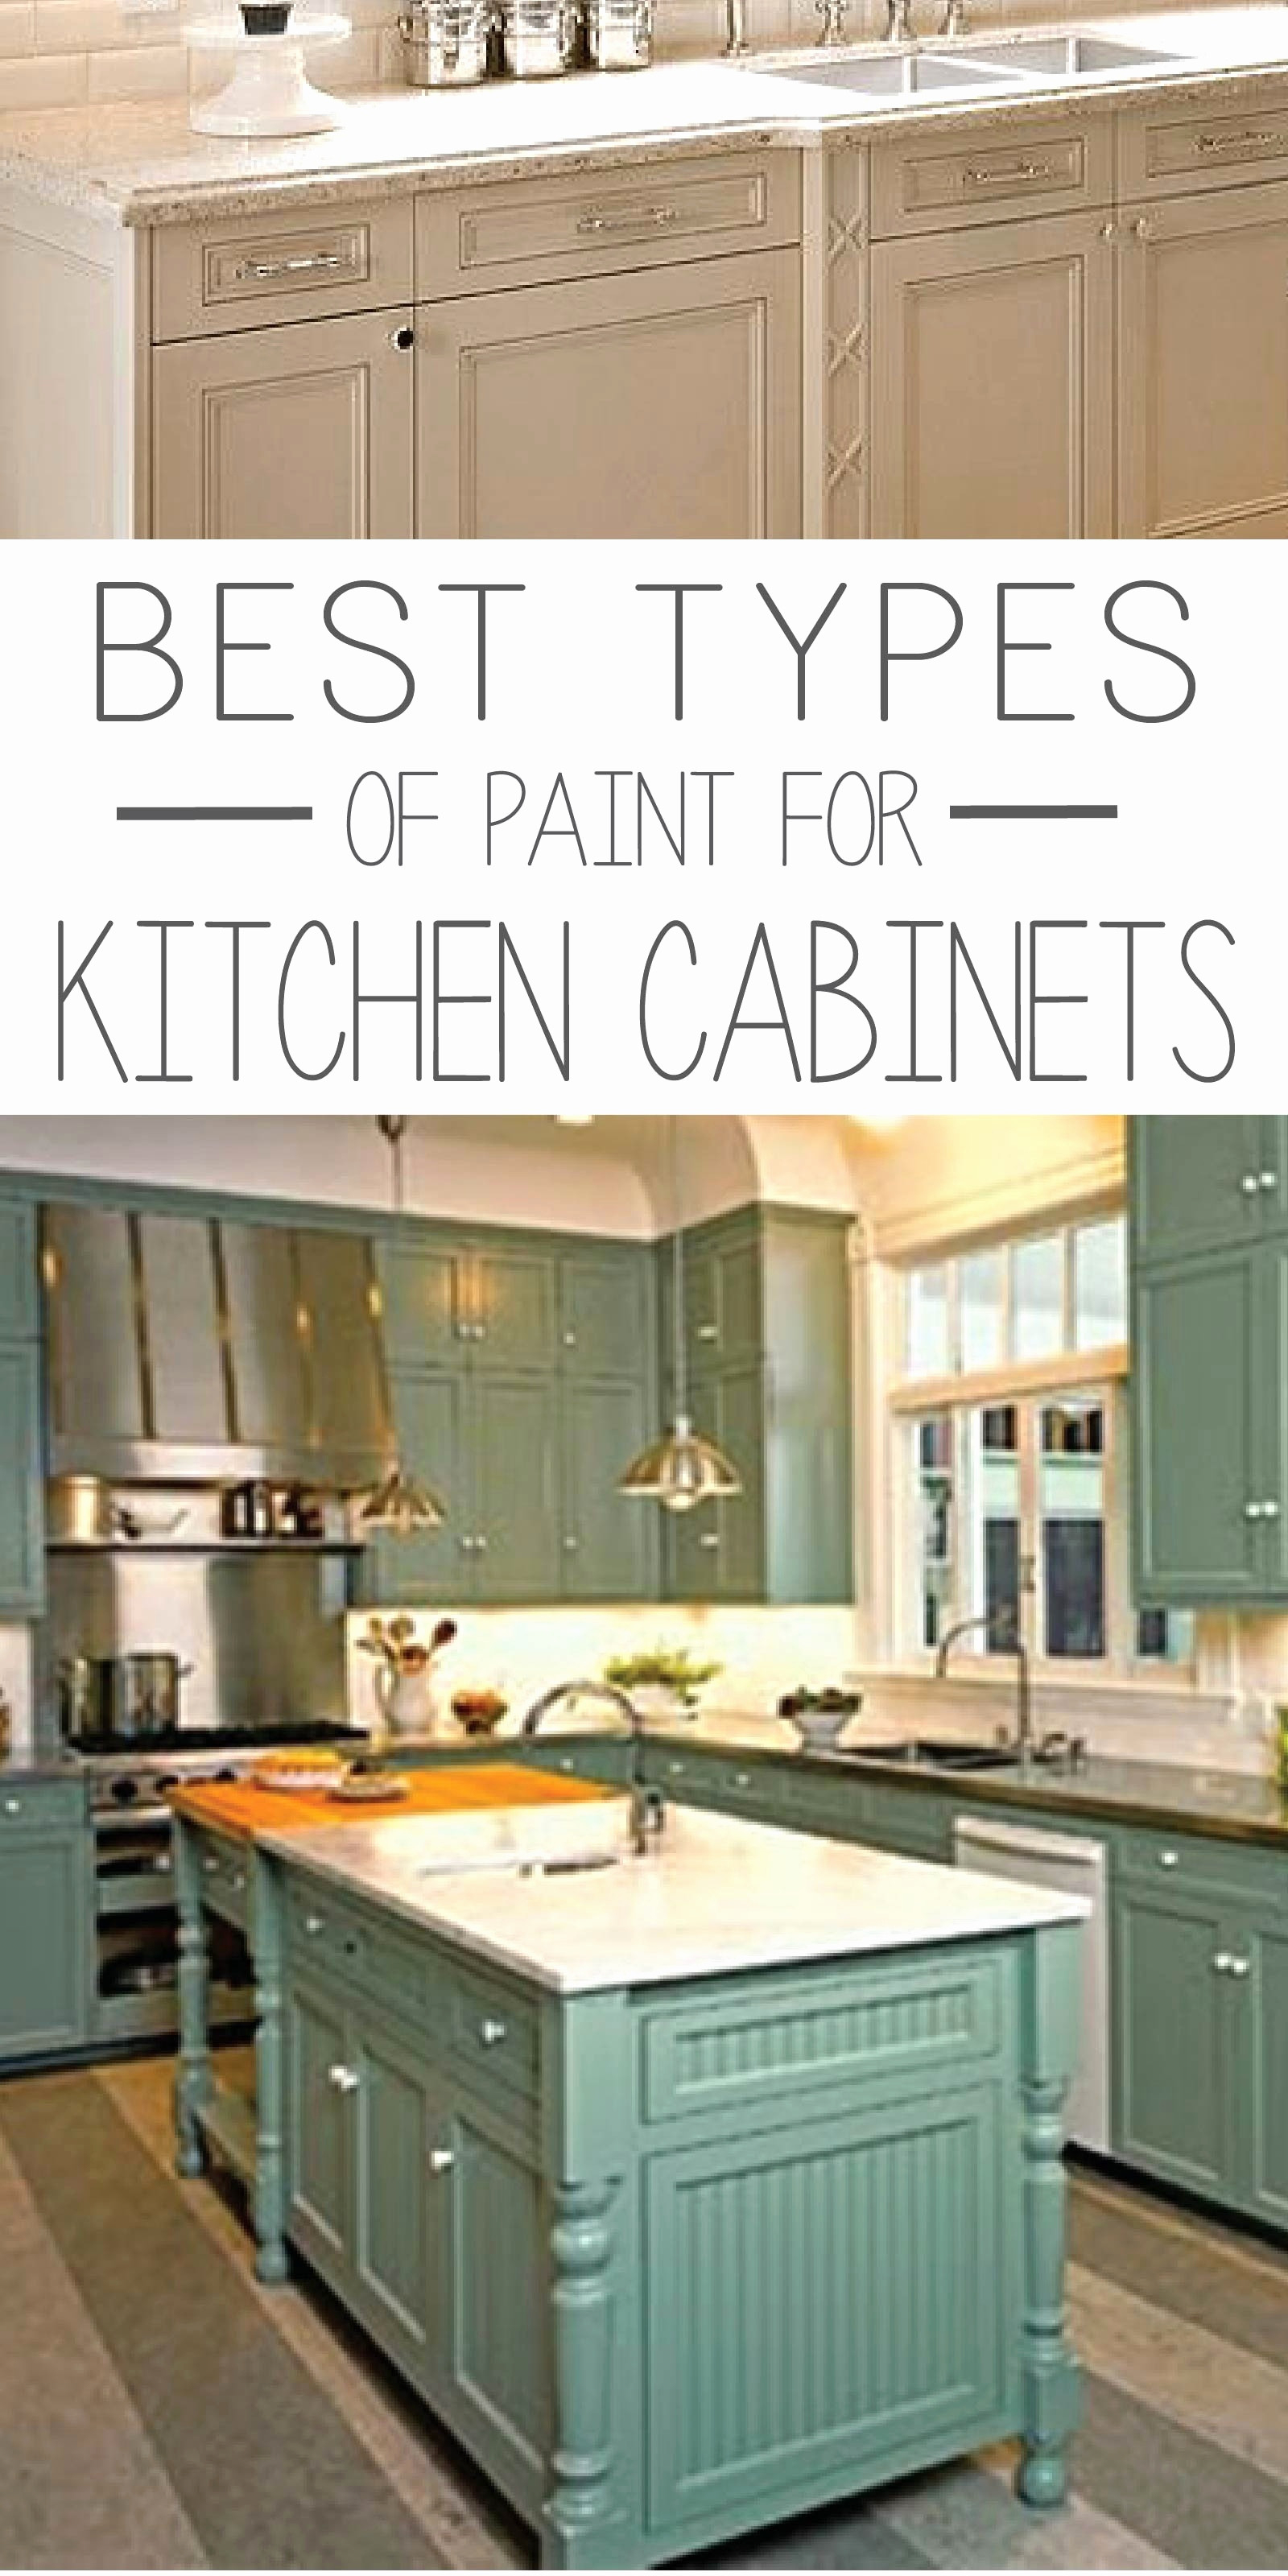 Graceful Kitchen Base Cabinet Drawer Inserts Or 21 Elegant For Size 1600 X 3200